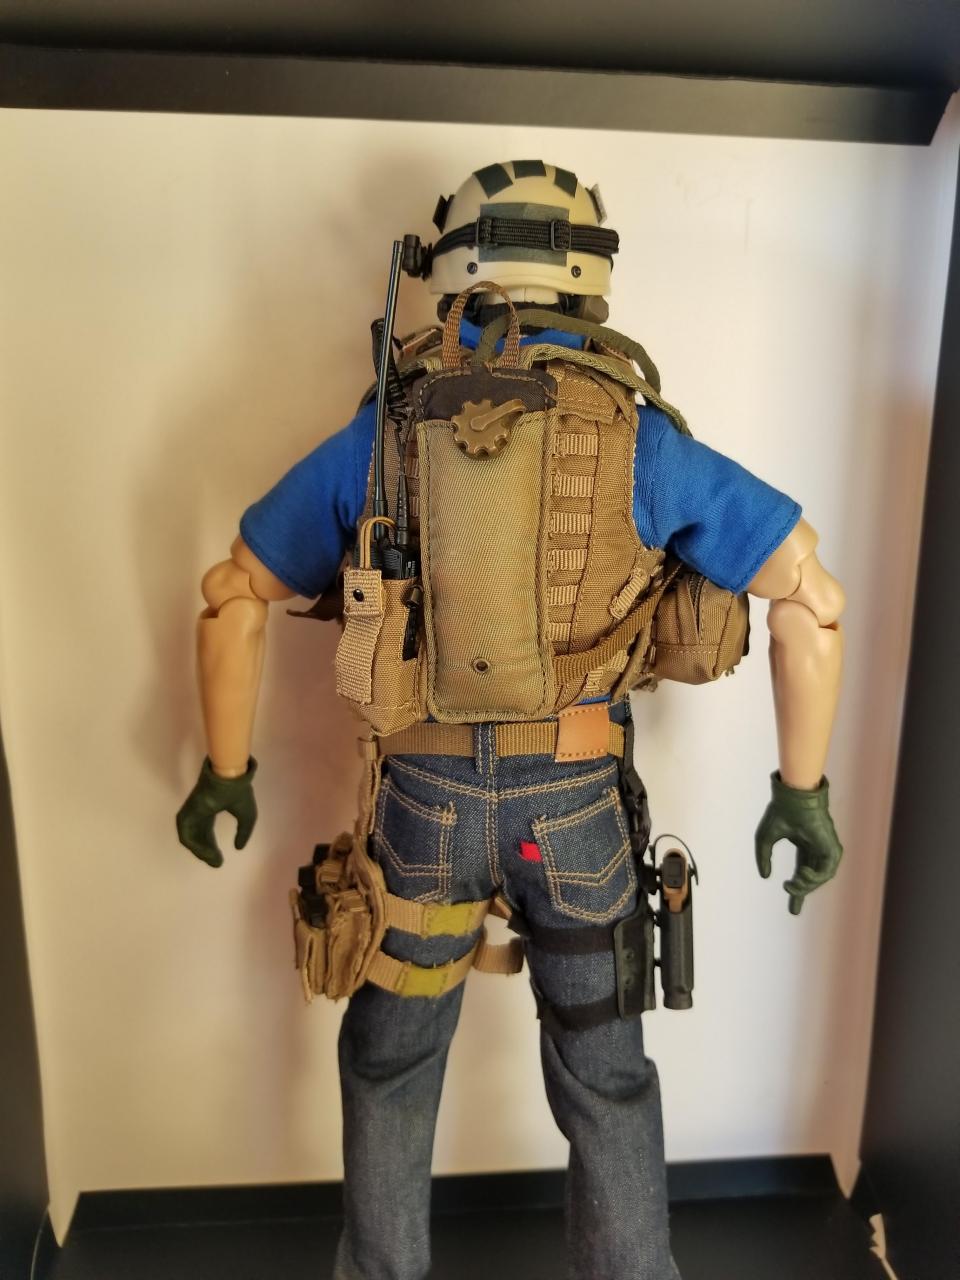 Modern Warfare 2 - Task Force 141 operative in urban wear (pic heavy)-6_-_f4bjwwq[1]-jpg